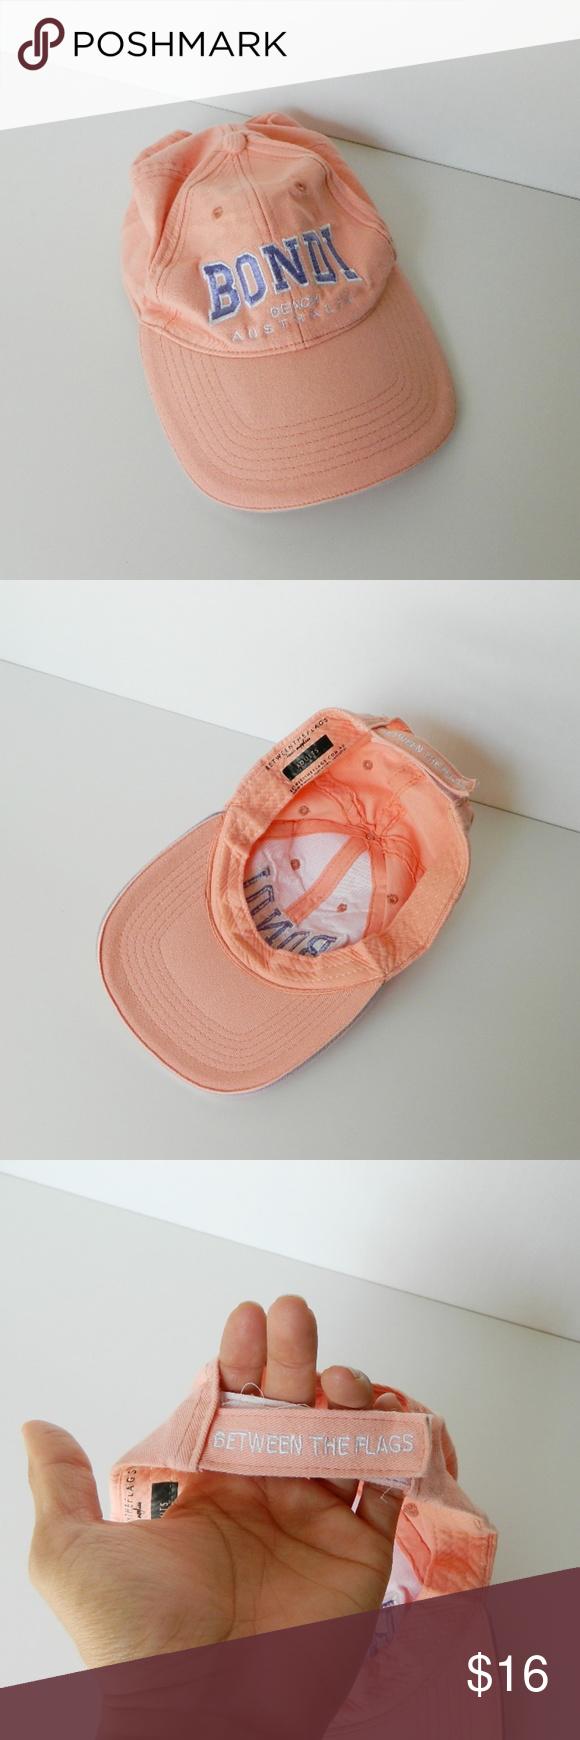 Bondi Beach Australia Peach Adult Ball Cap Hat In excellent pre-owned  condition Bondi Beach dcf74e45ac0